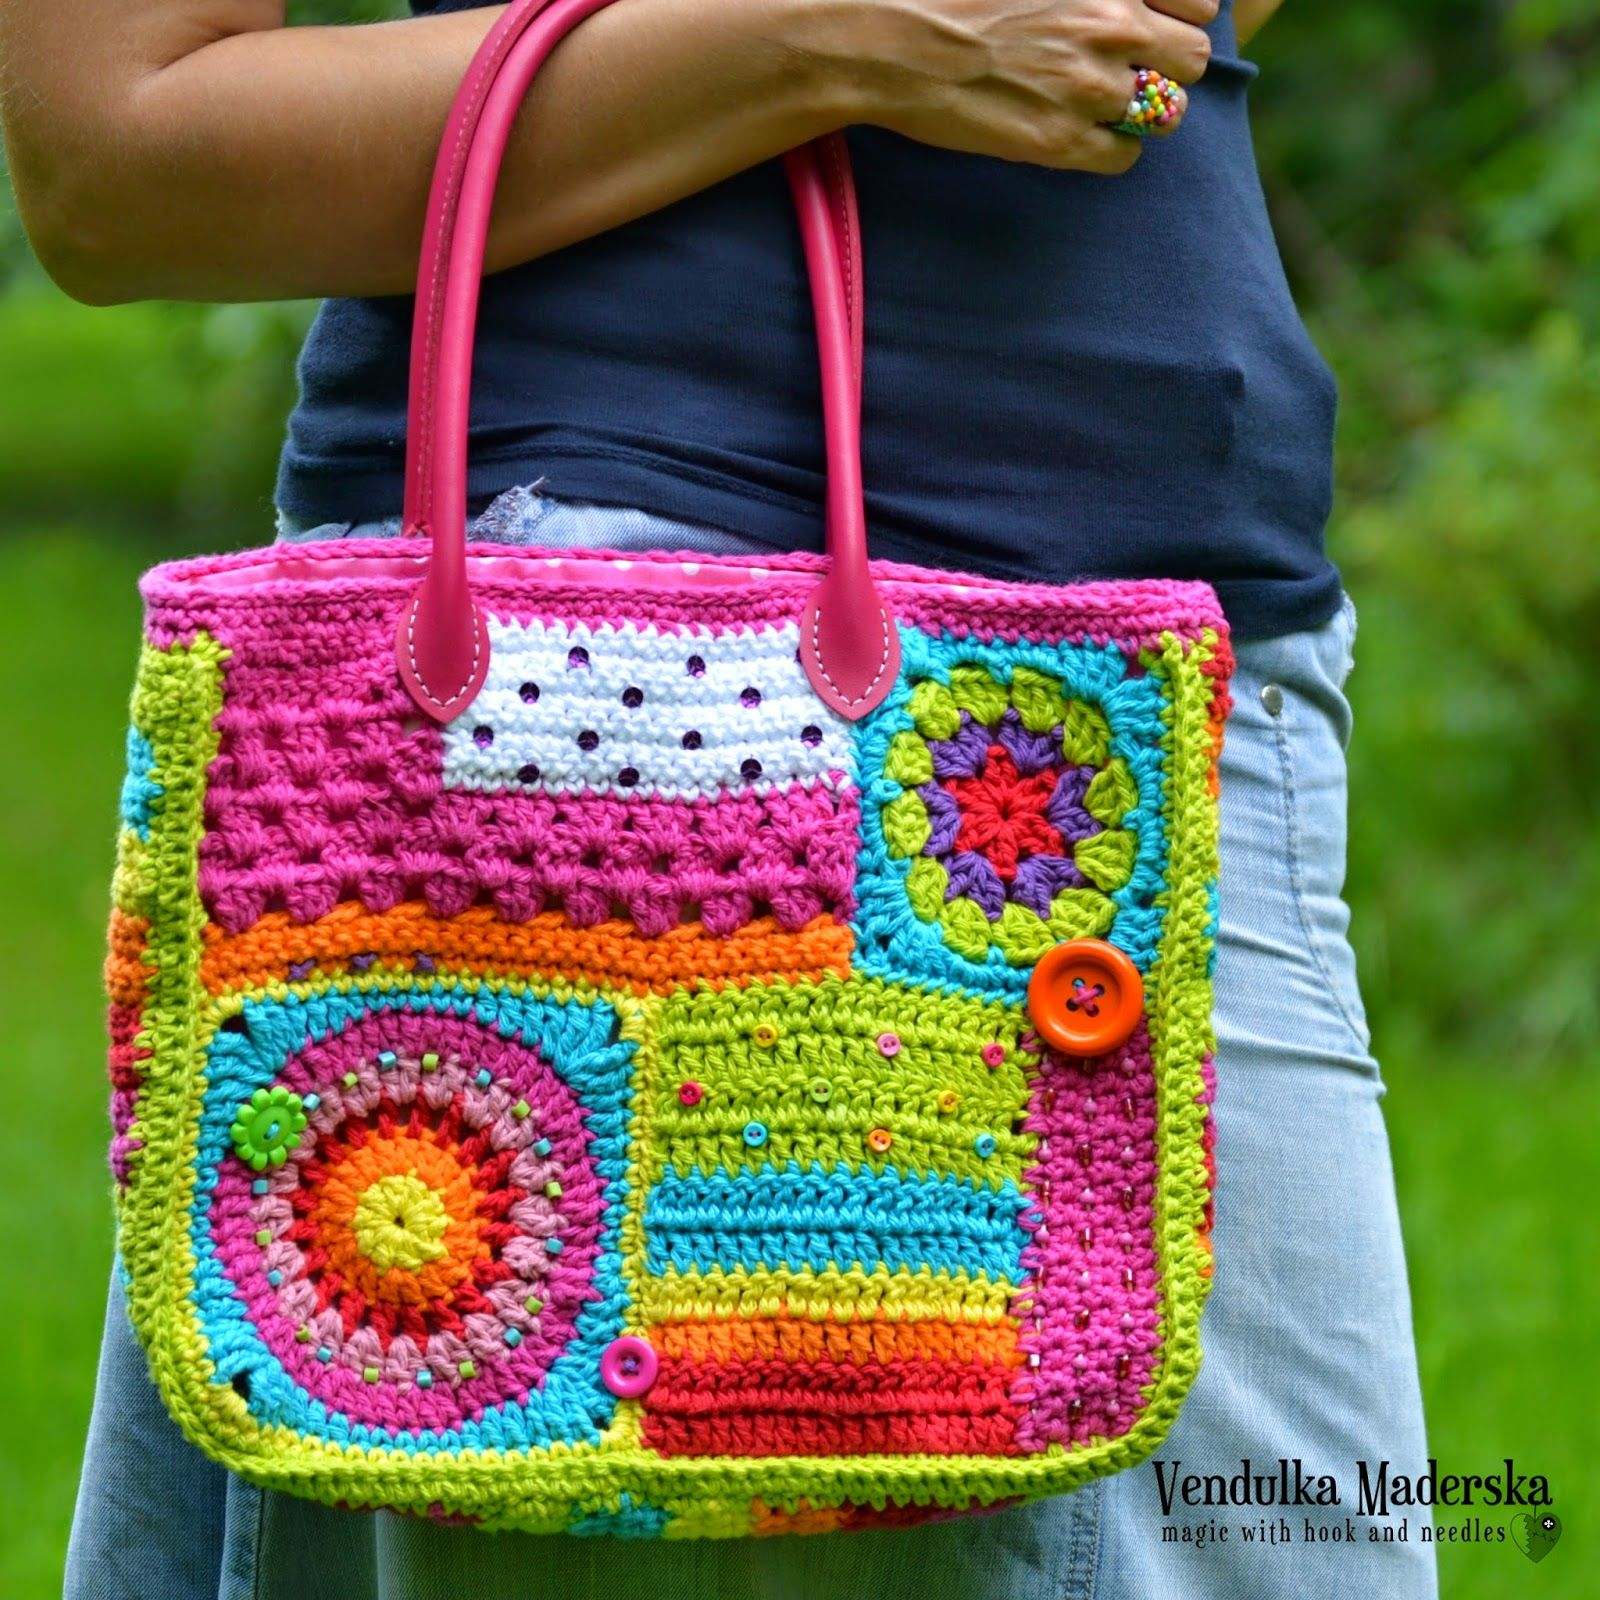 Crazy rainbow bag pattern | mochila niñas fantasia | Pinterest ...